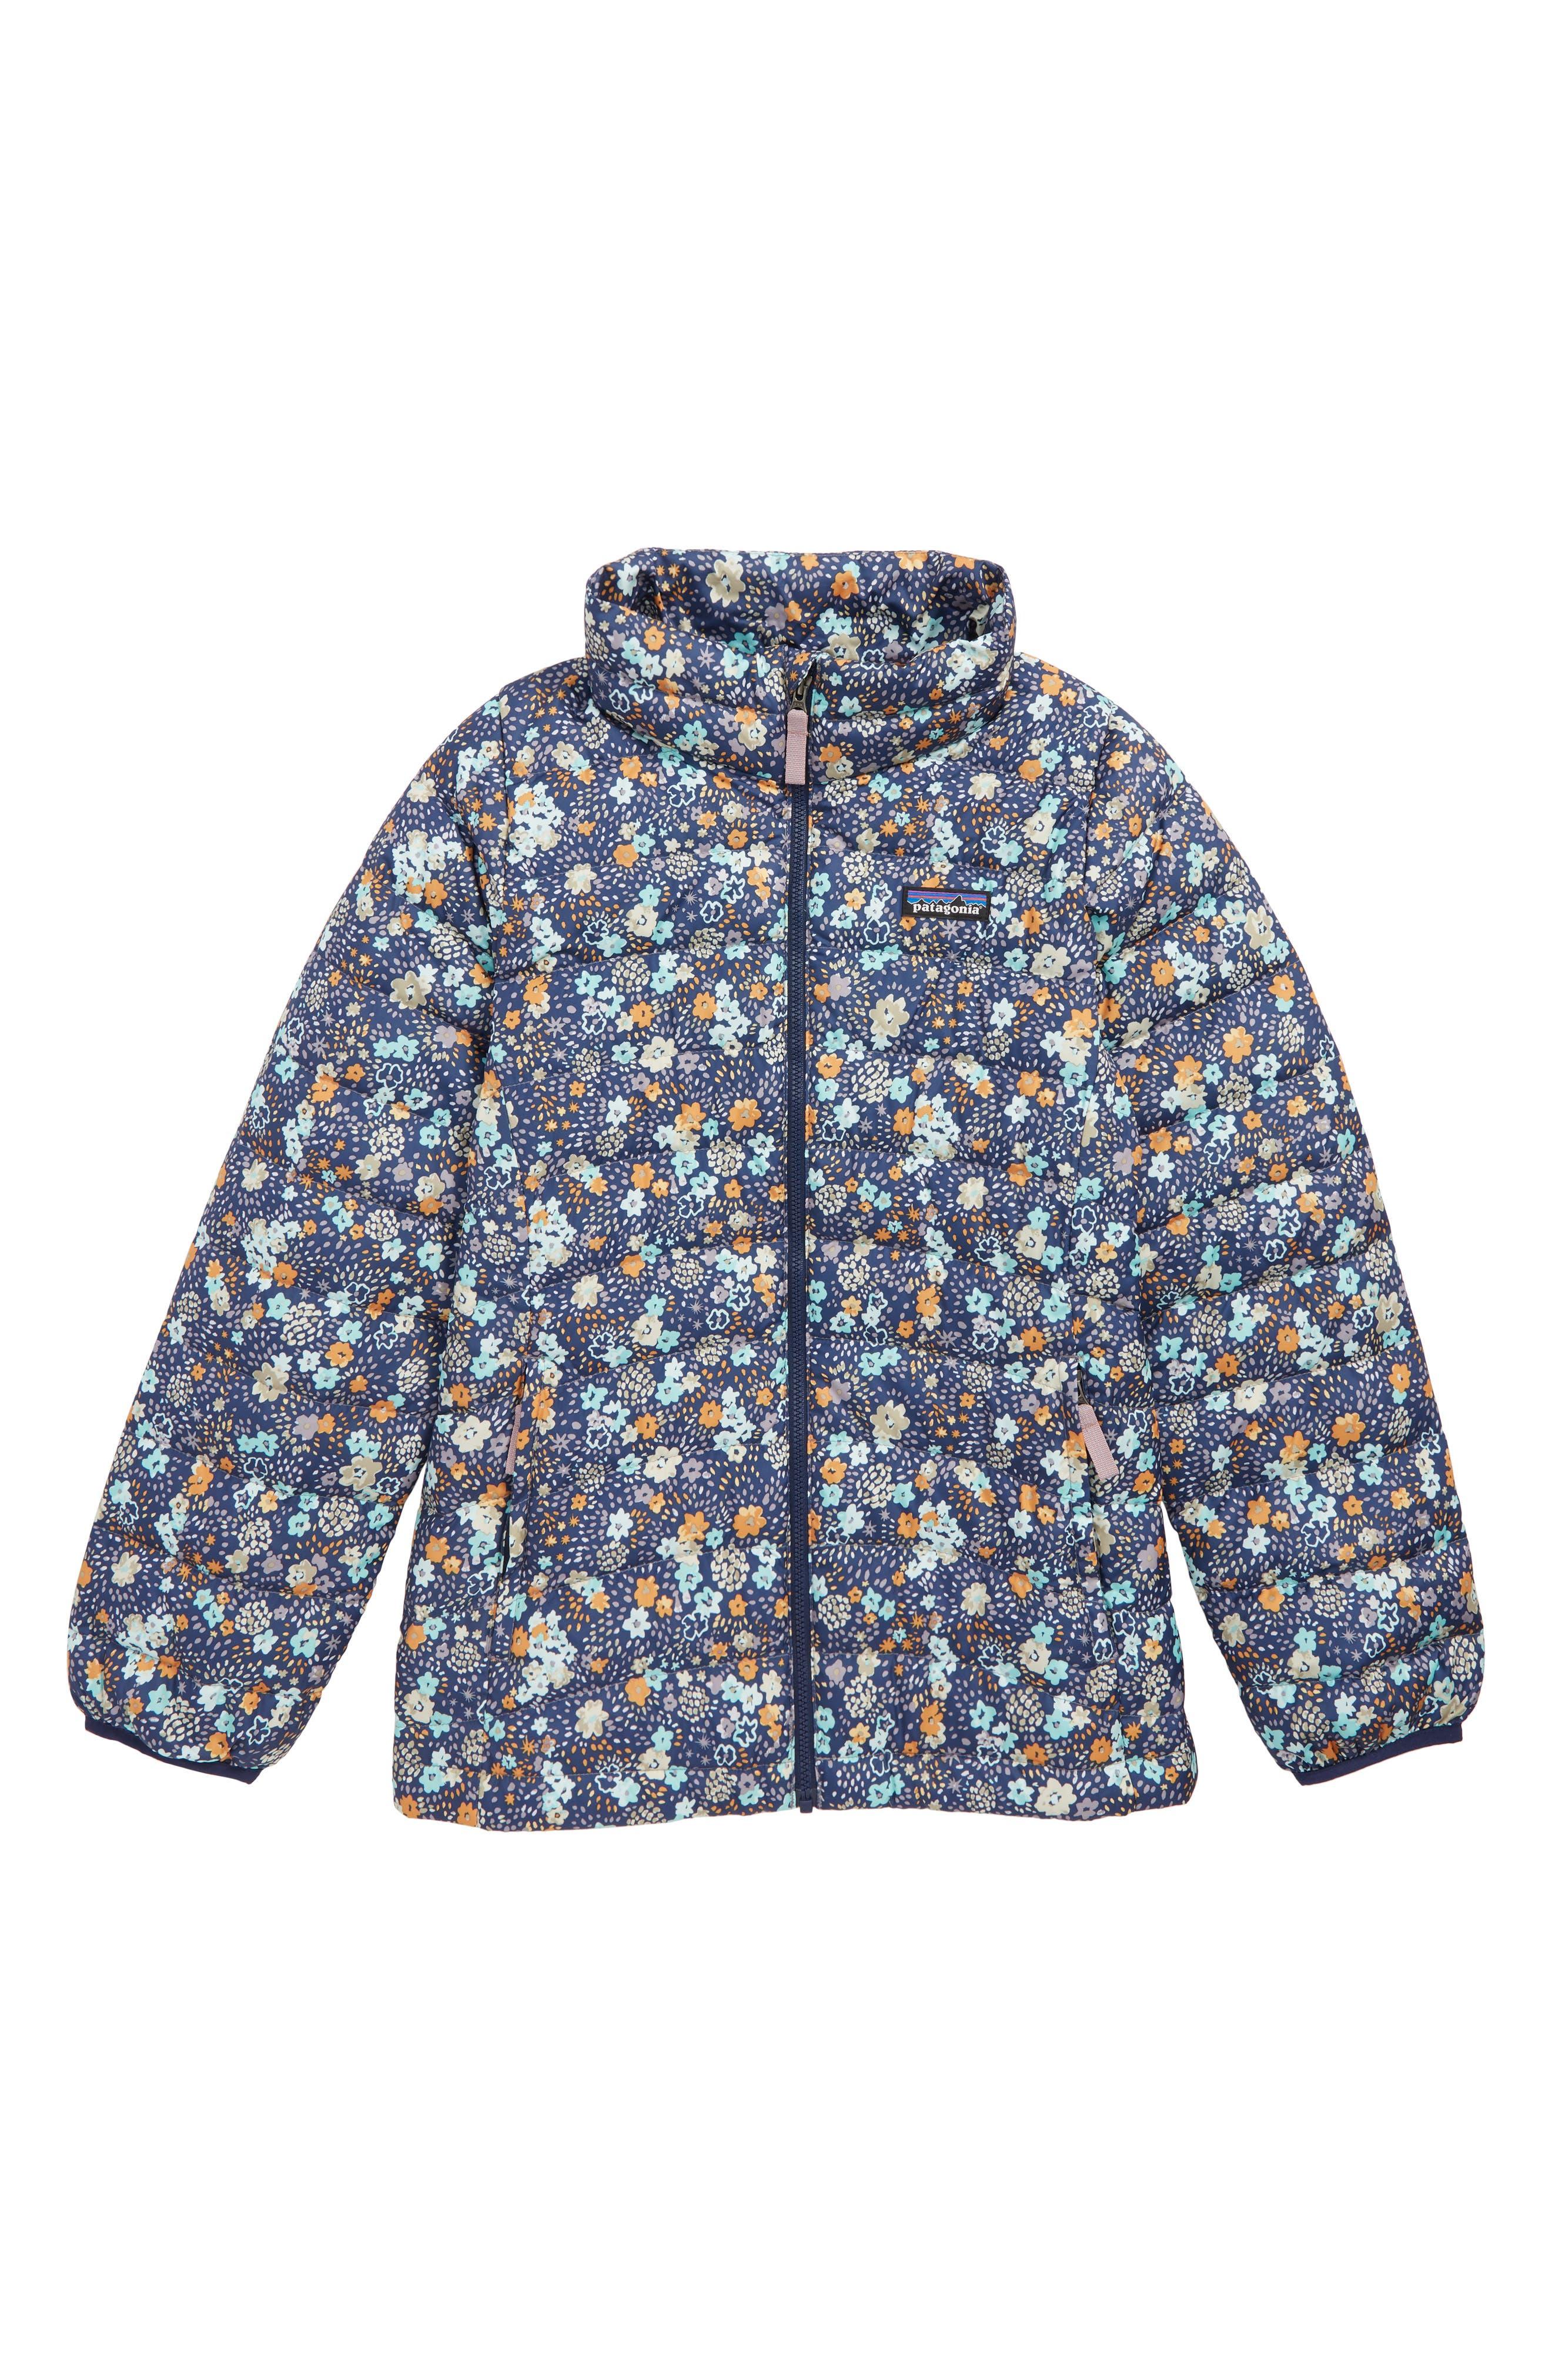 Down Jacket,                         Main,                         color, 420